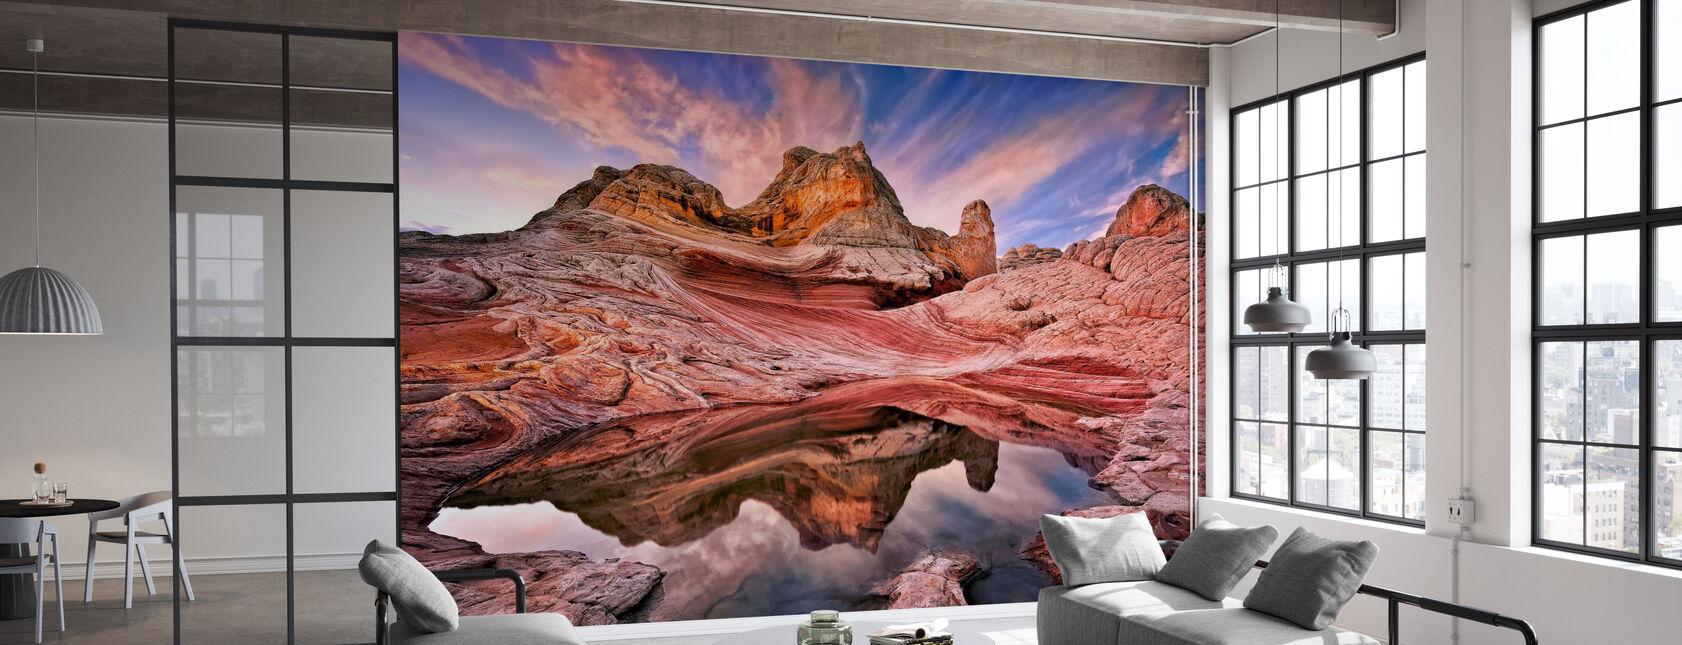 Arizona Reflection - Wallpaper - Office